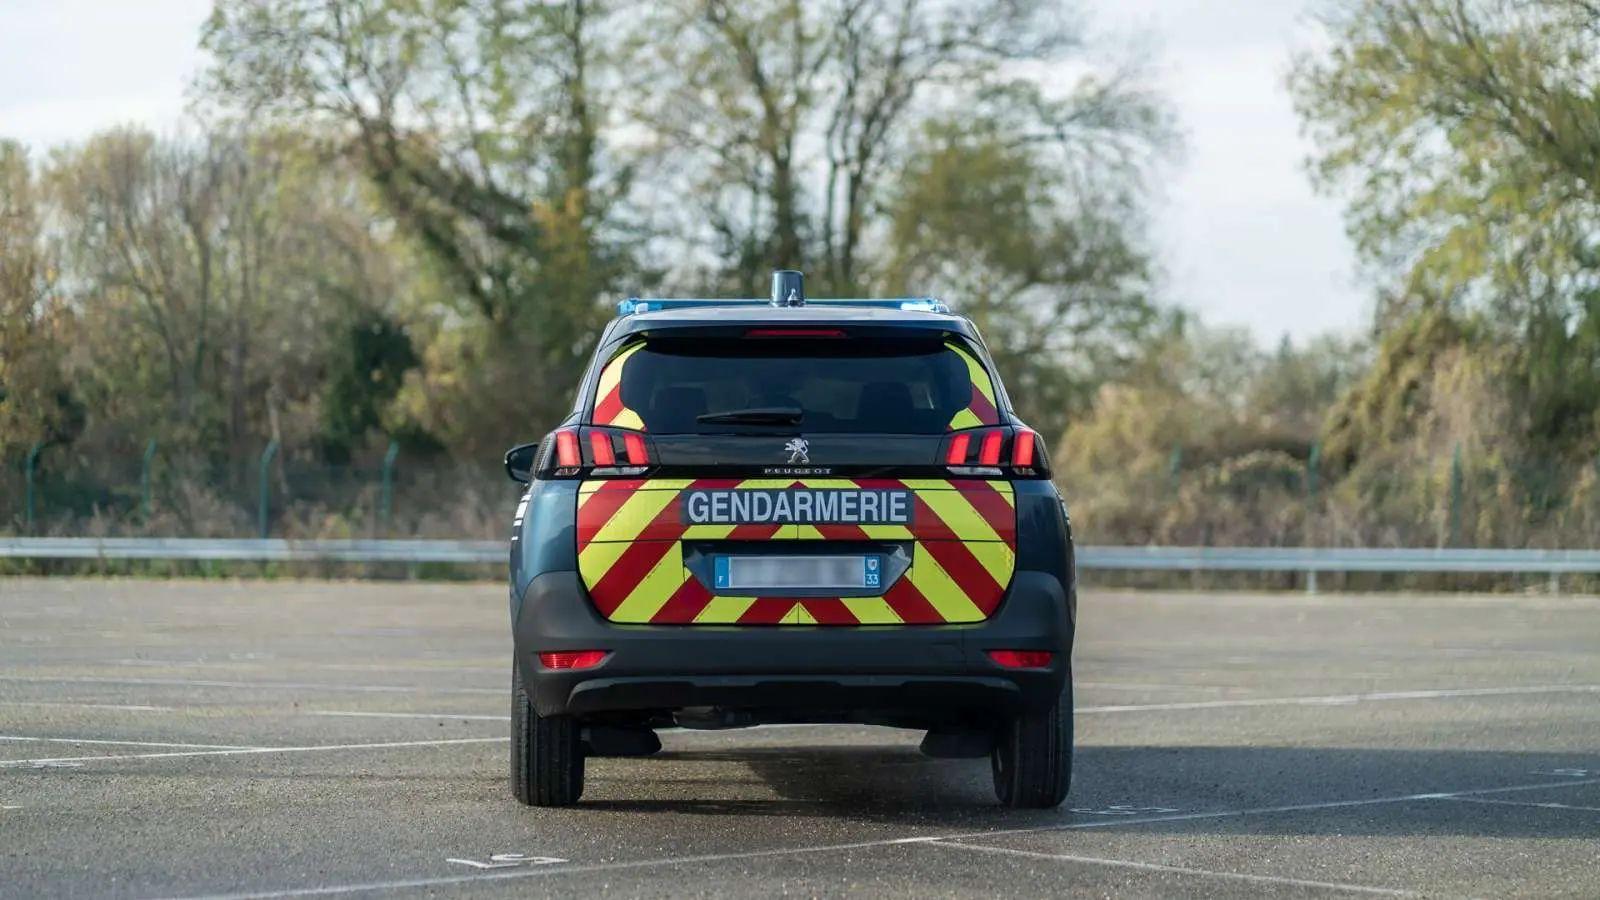 Peugeot 5008 police gendarmerie 9